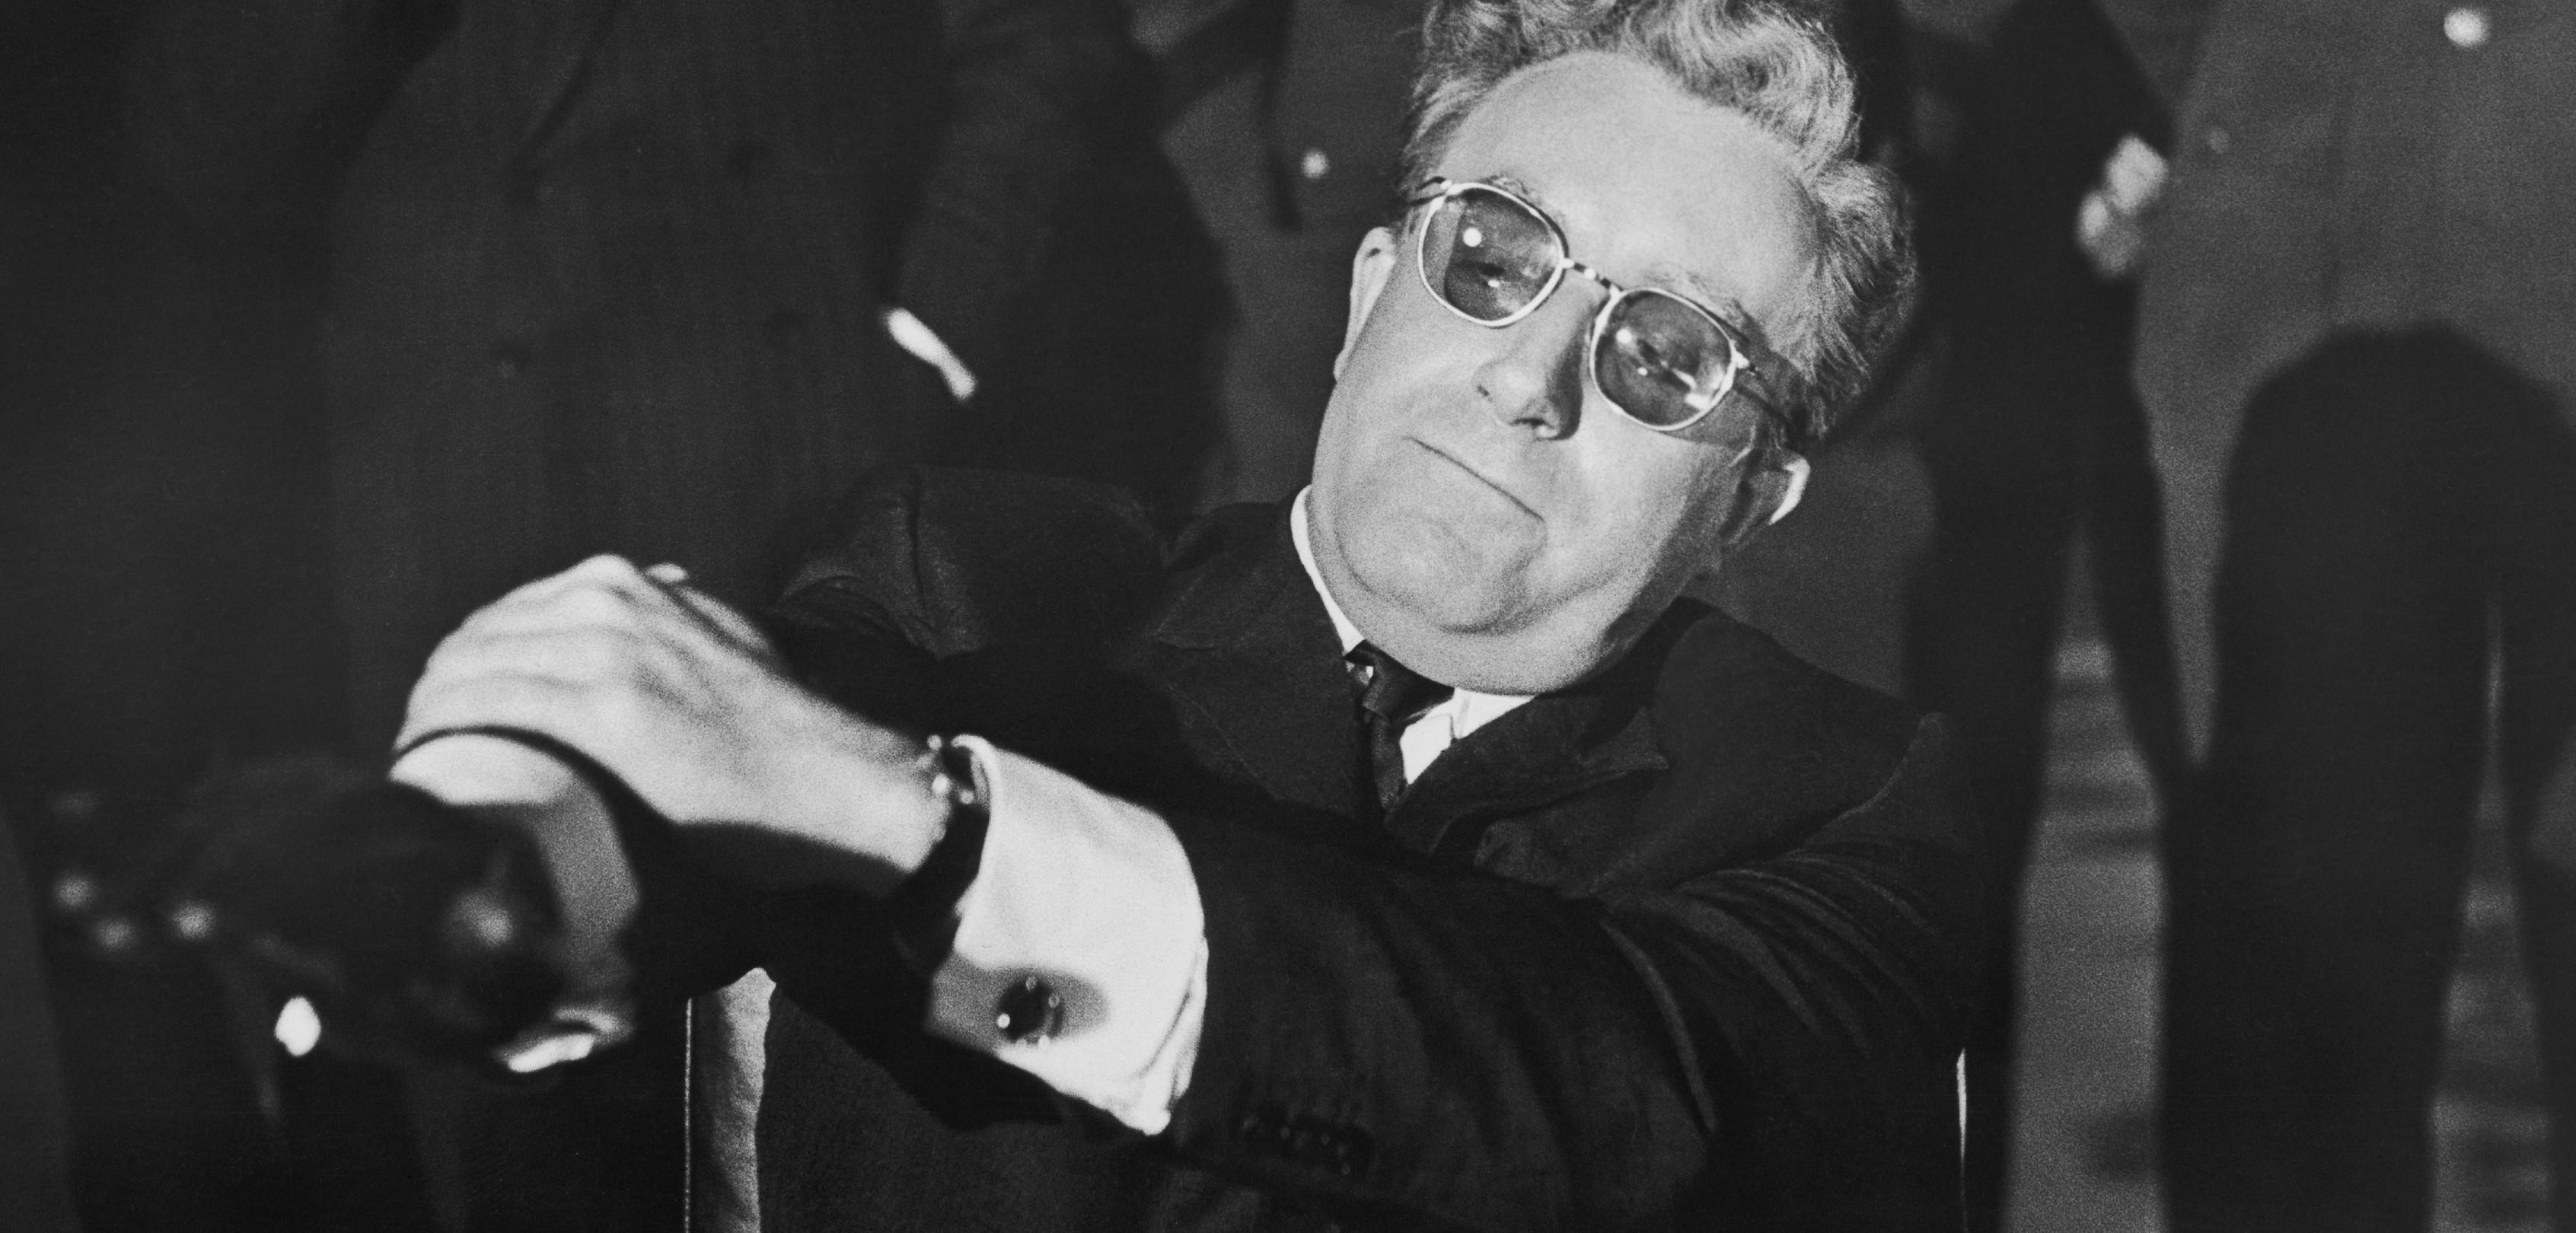 Peter Sellars played Dr. Strangelove in Kubrick's 1964 farce.